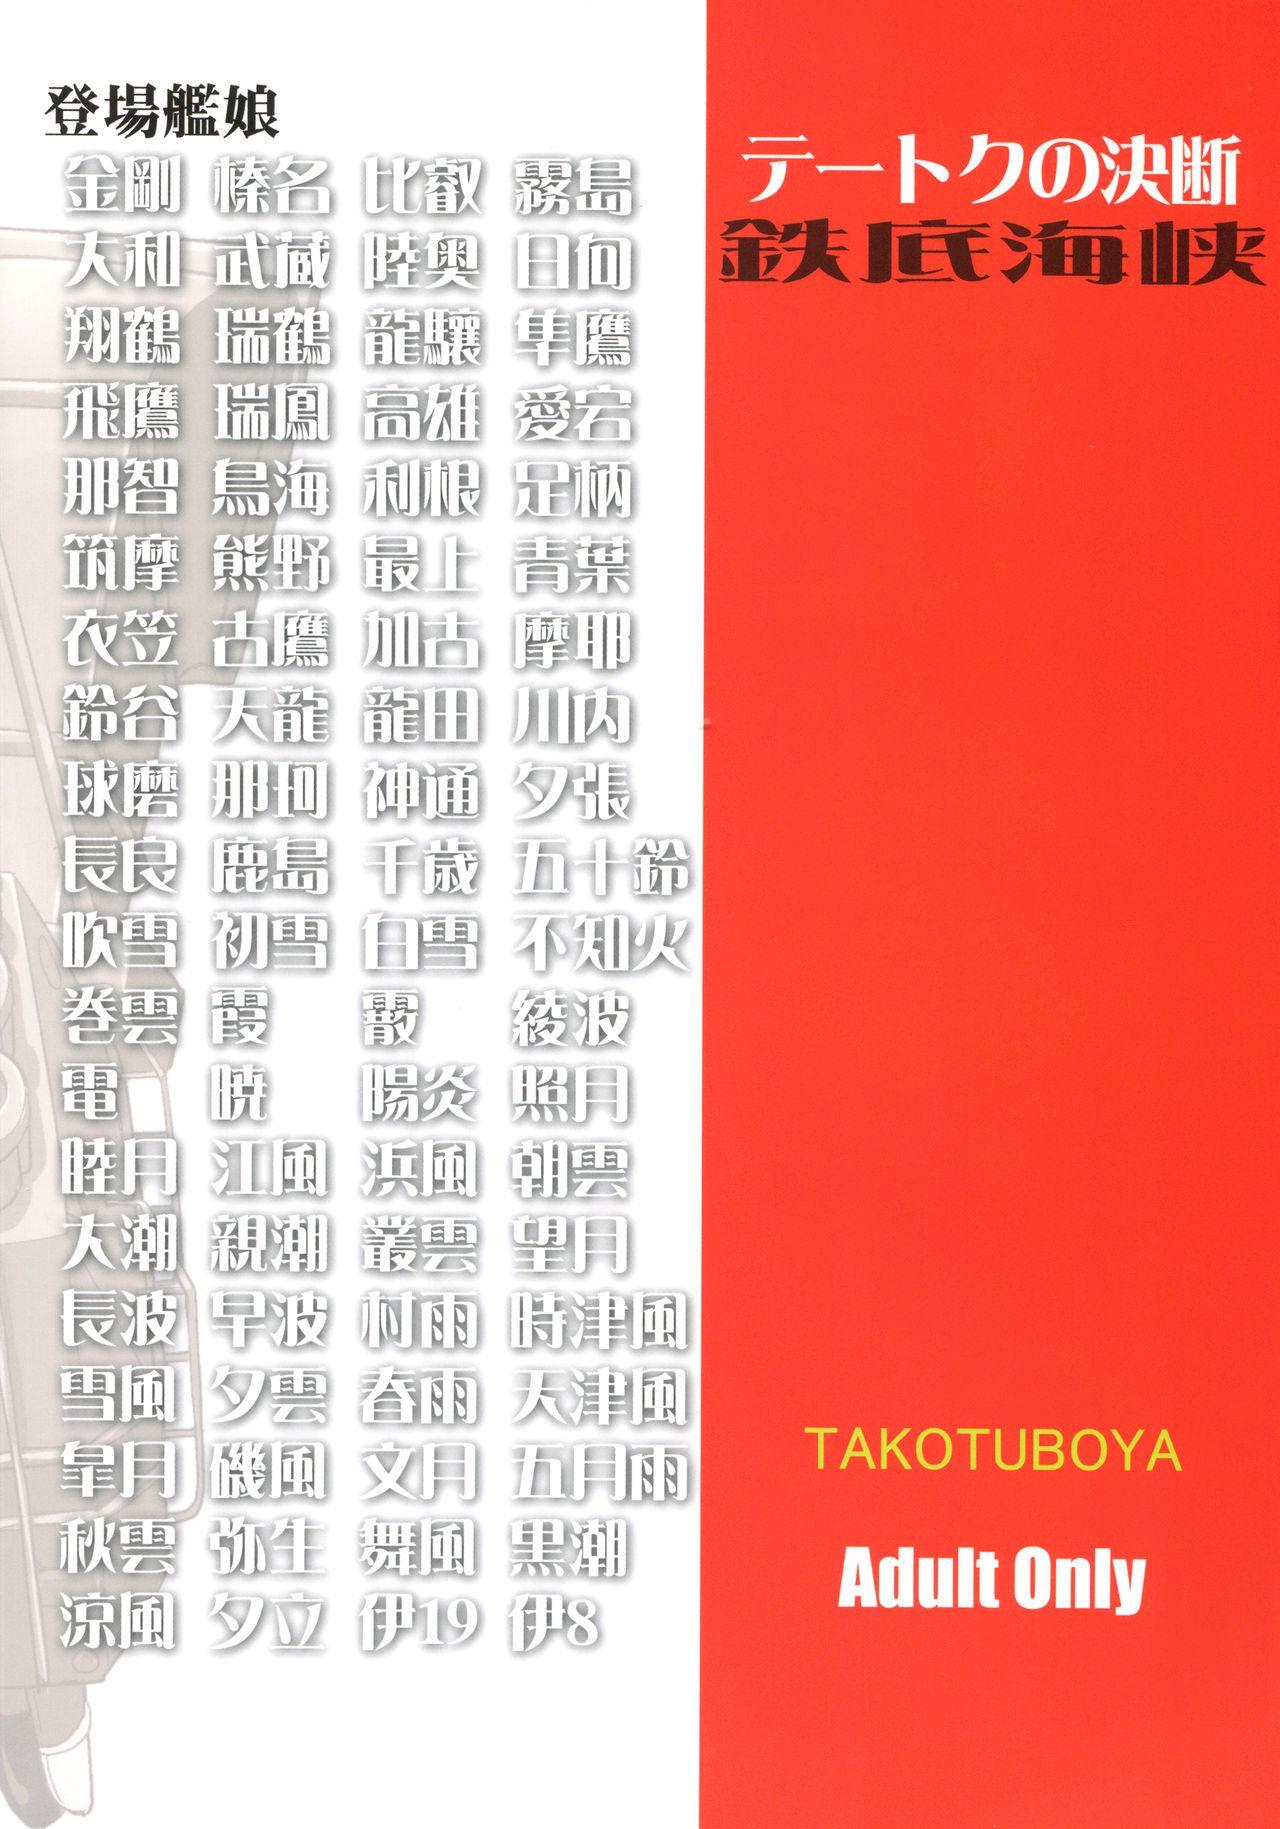 Teitoku no Ketsudan - Tetsutei Kaikyou   Admiral's Decision: Iron Bottom Sound 57